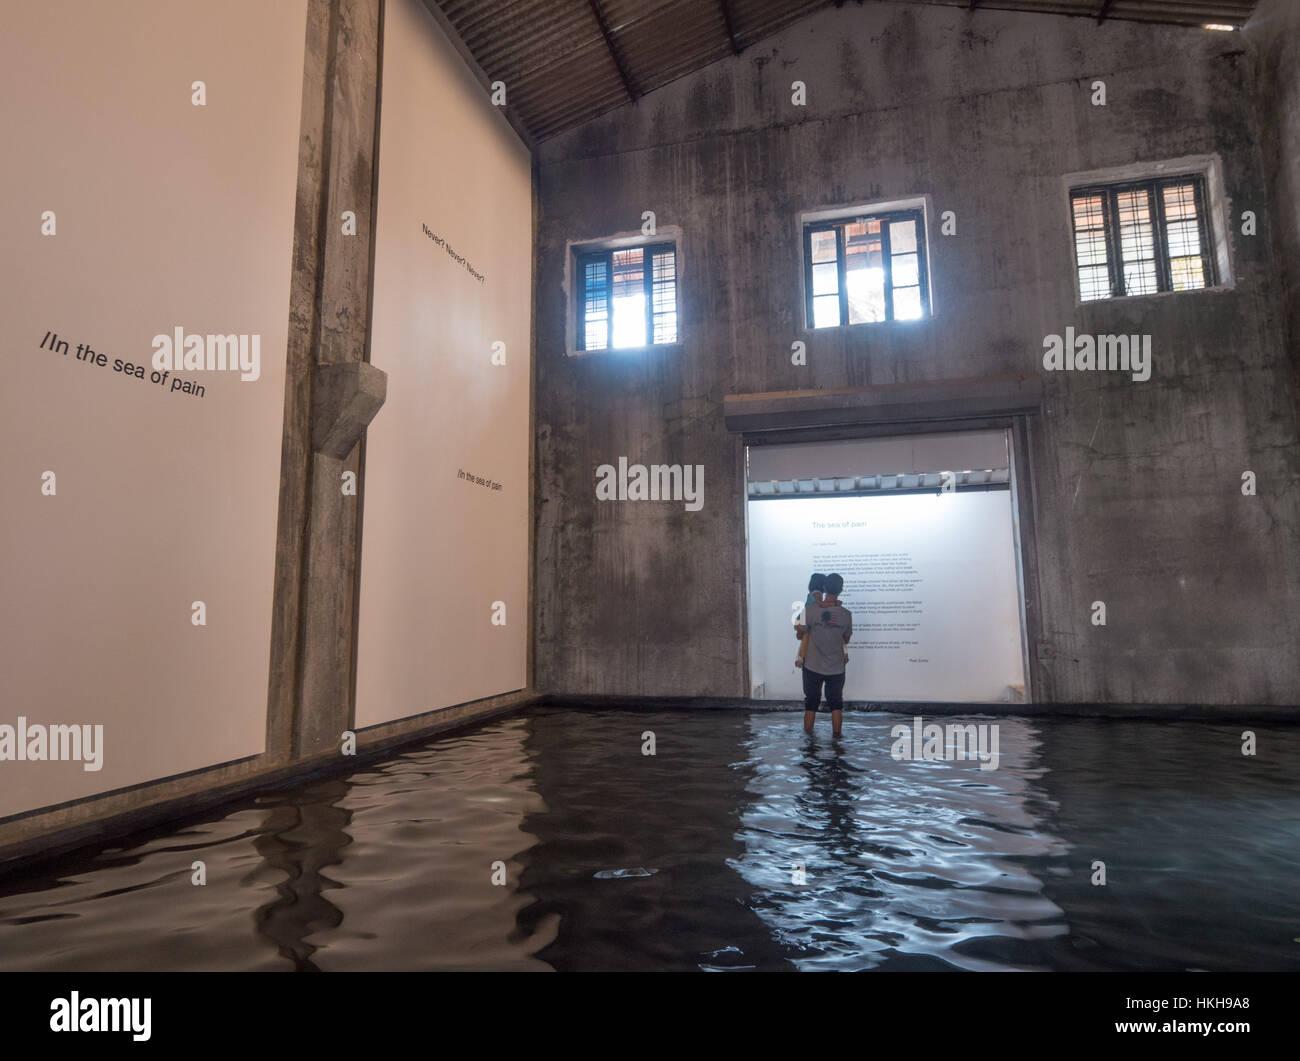 The Sea of Pain by Raul Zurita Aspinwall House at Kochi-Muziris Biennale in India Stock Photo